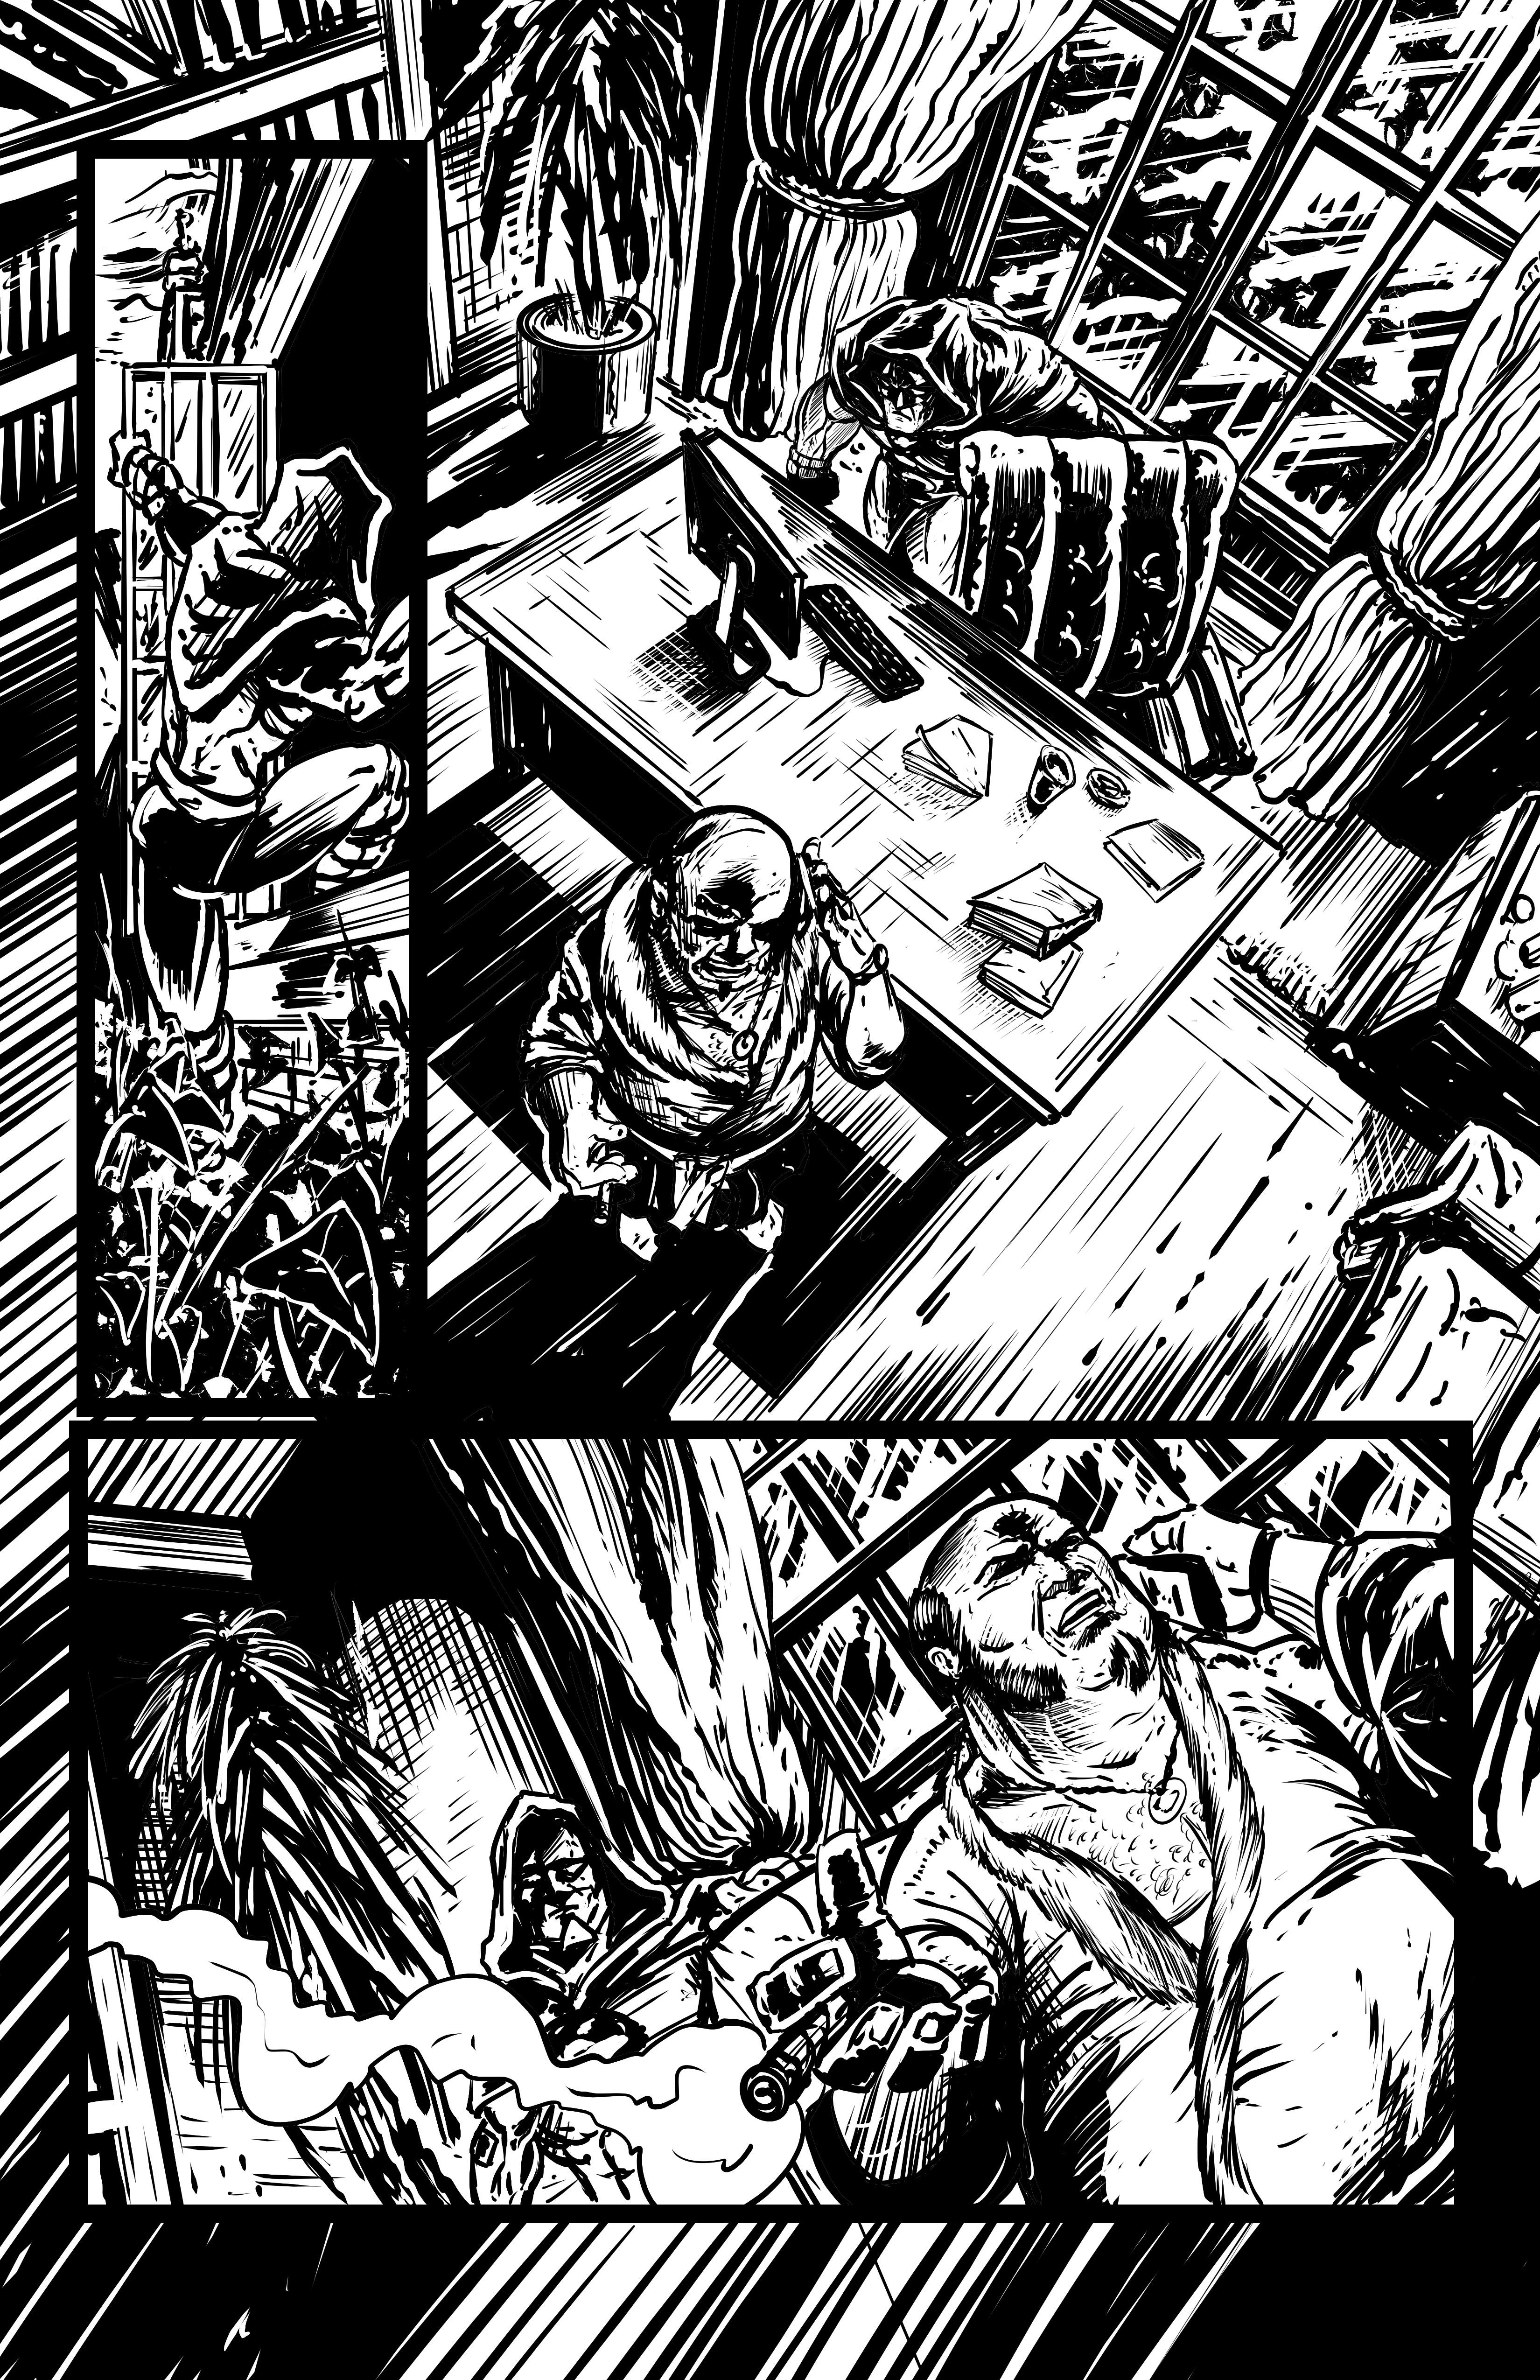 Johnny Saturn: Spiral City Noir, pg9